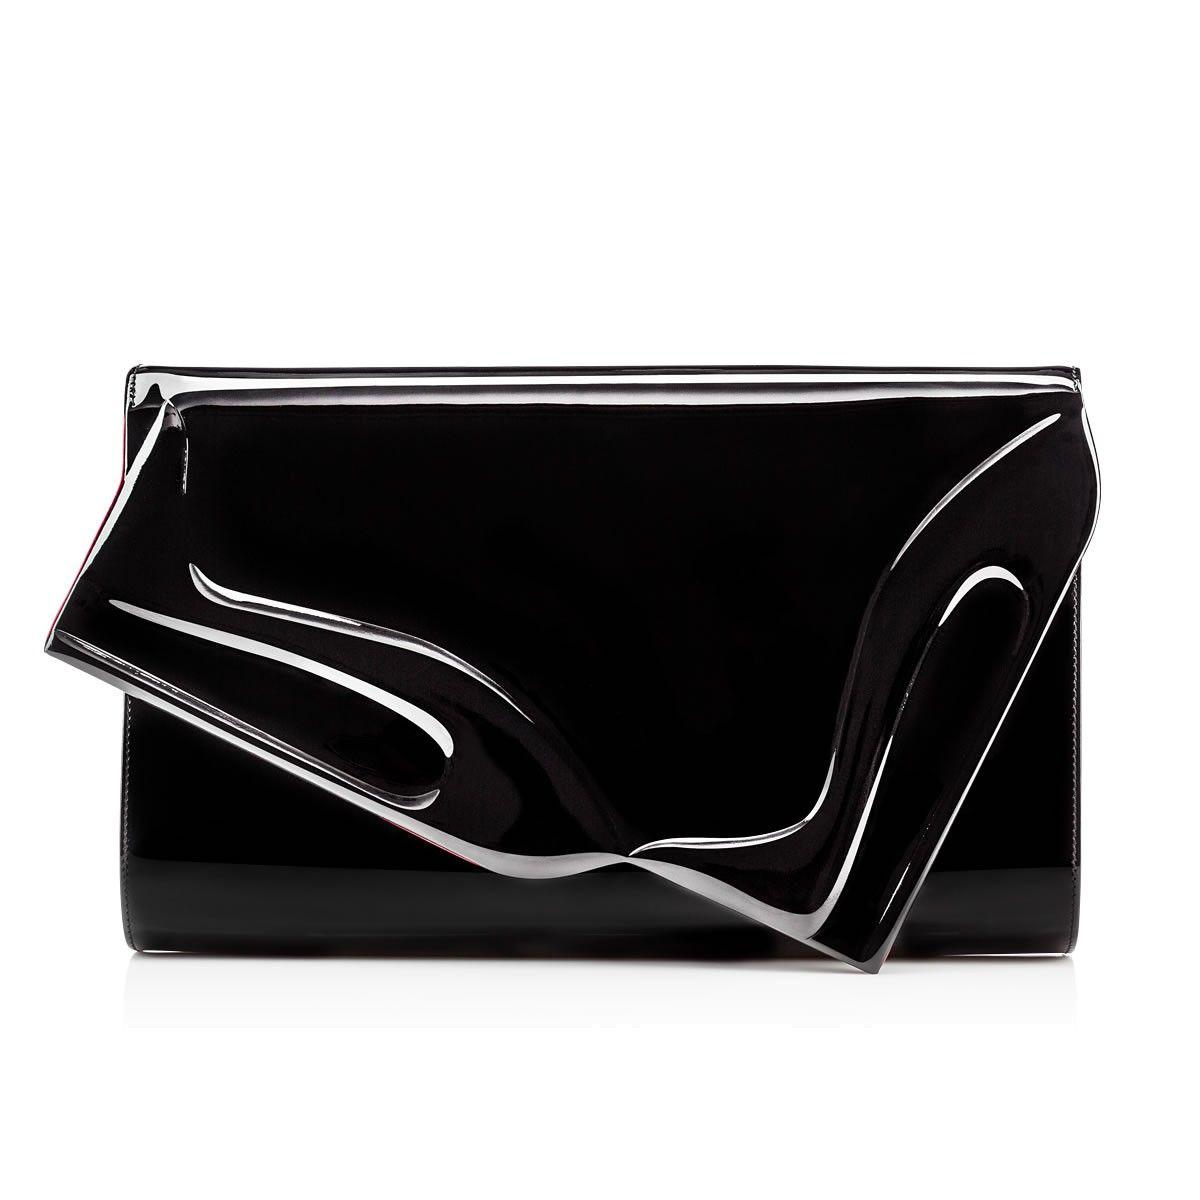 6bb44fa59aa CHRISTIAN LOUBOUTIN So Kate Clutch Black Patent Leather ...